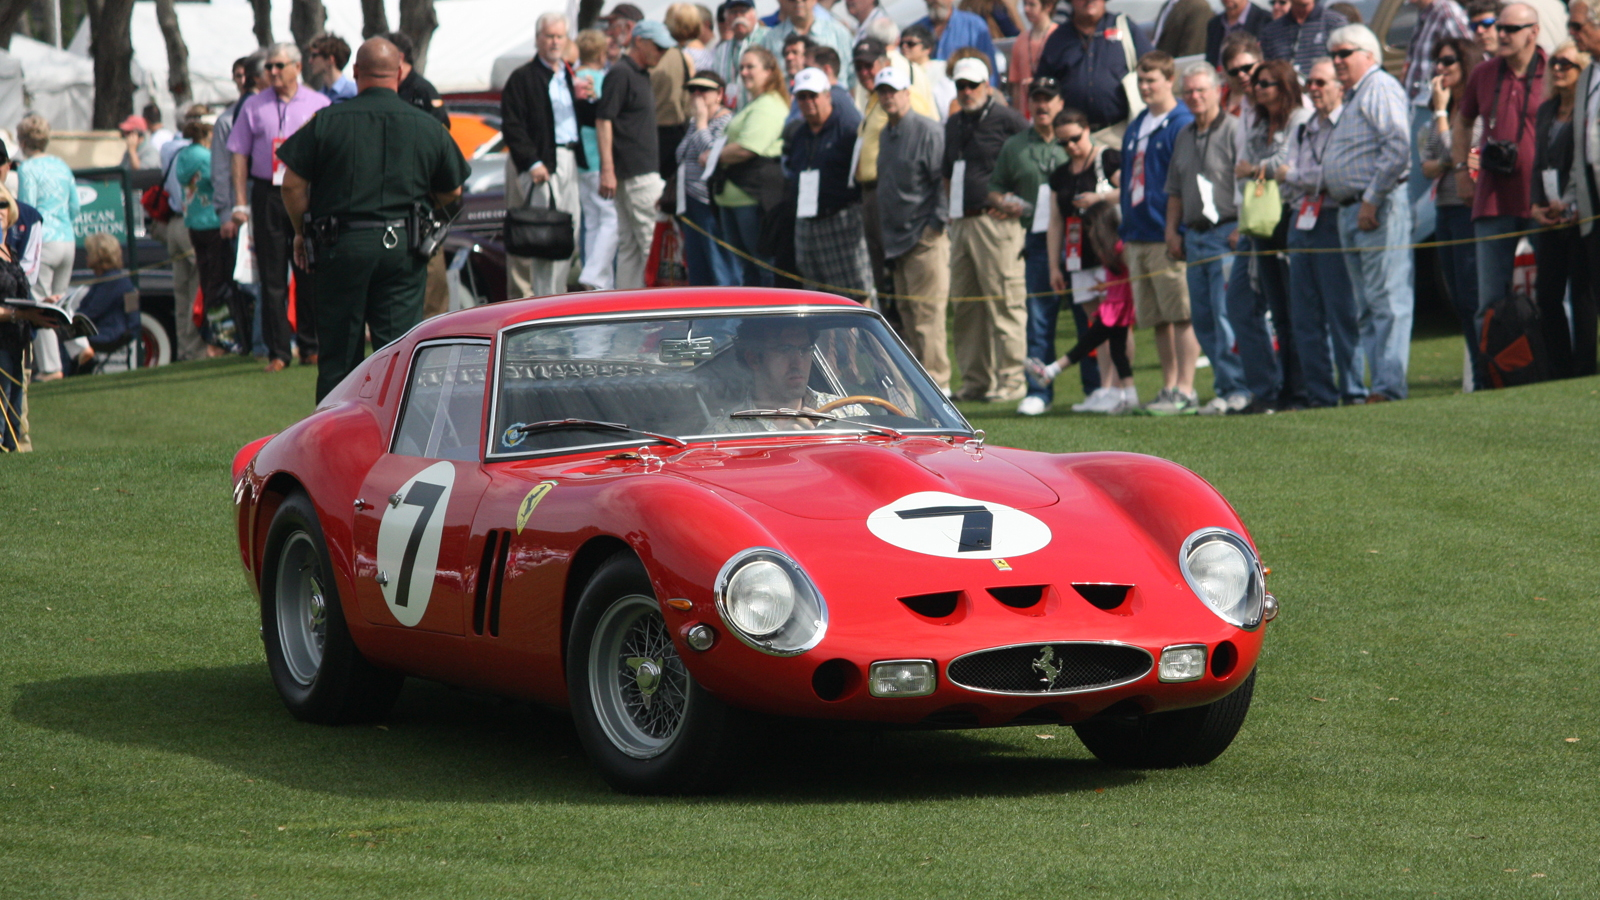 Jim Jaeger's 1962 Ferrari 330 LM